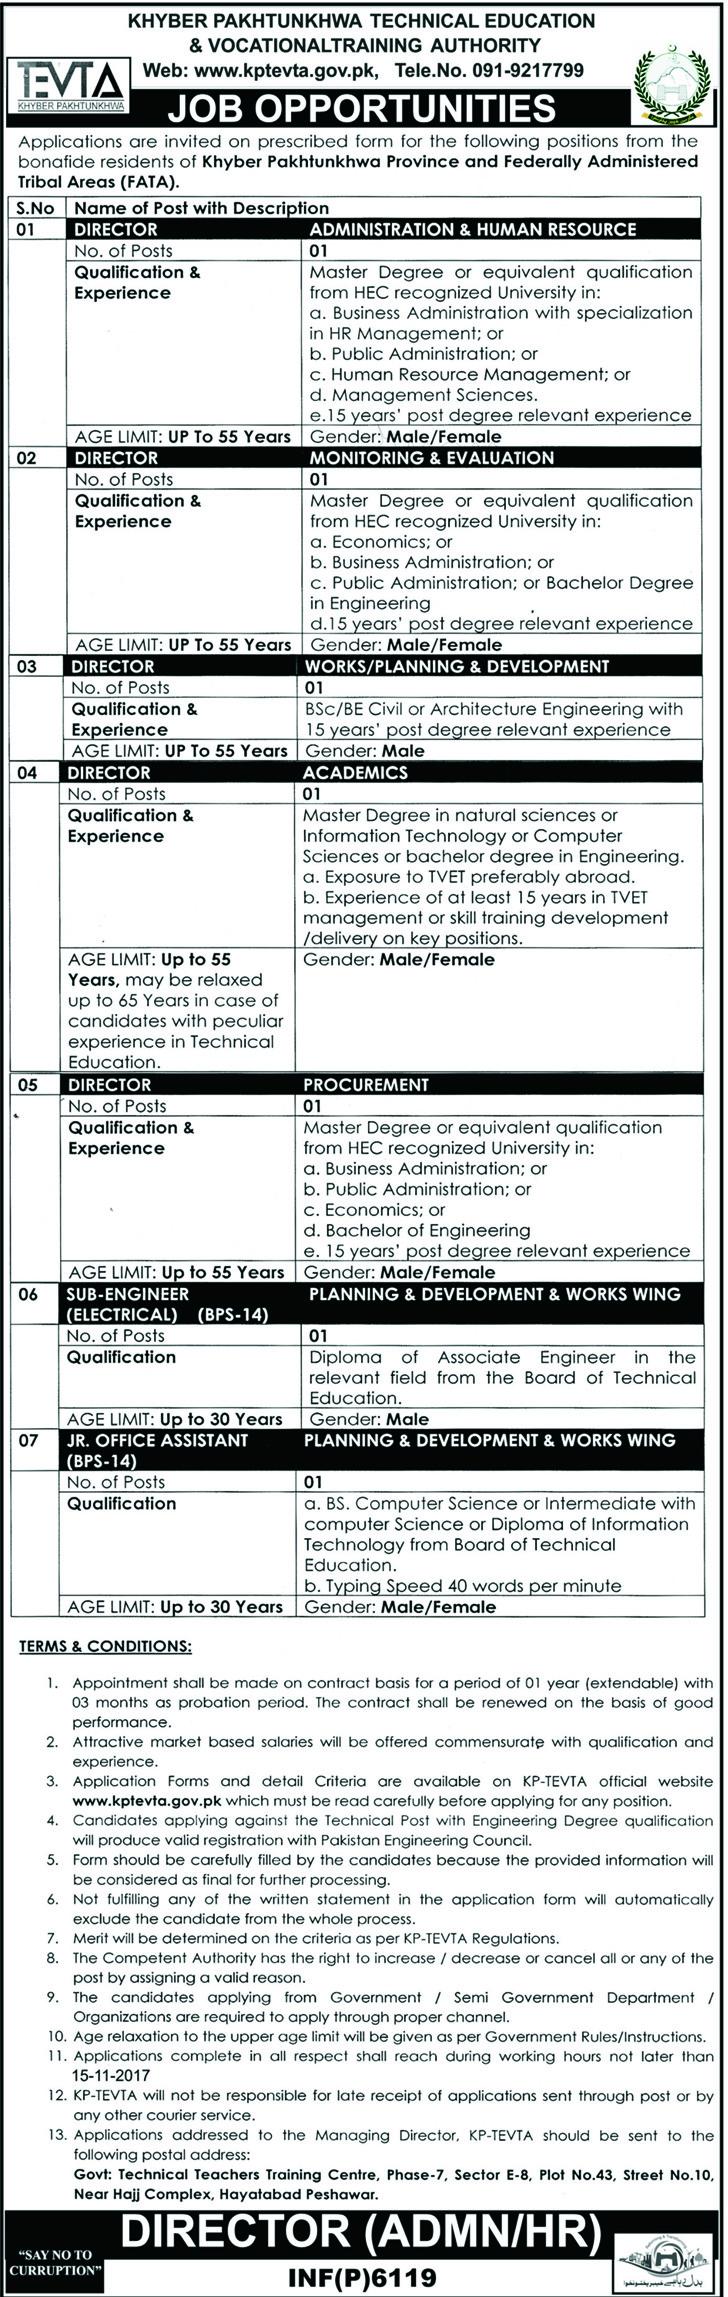 TEVTA Jobs 2017 in Khyber Pakhtunkhwa